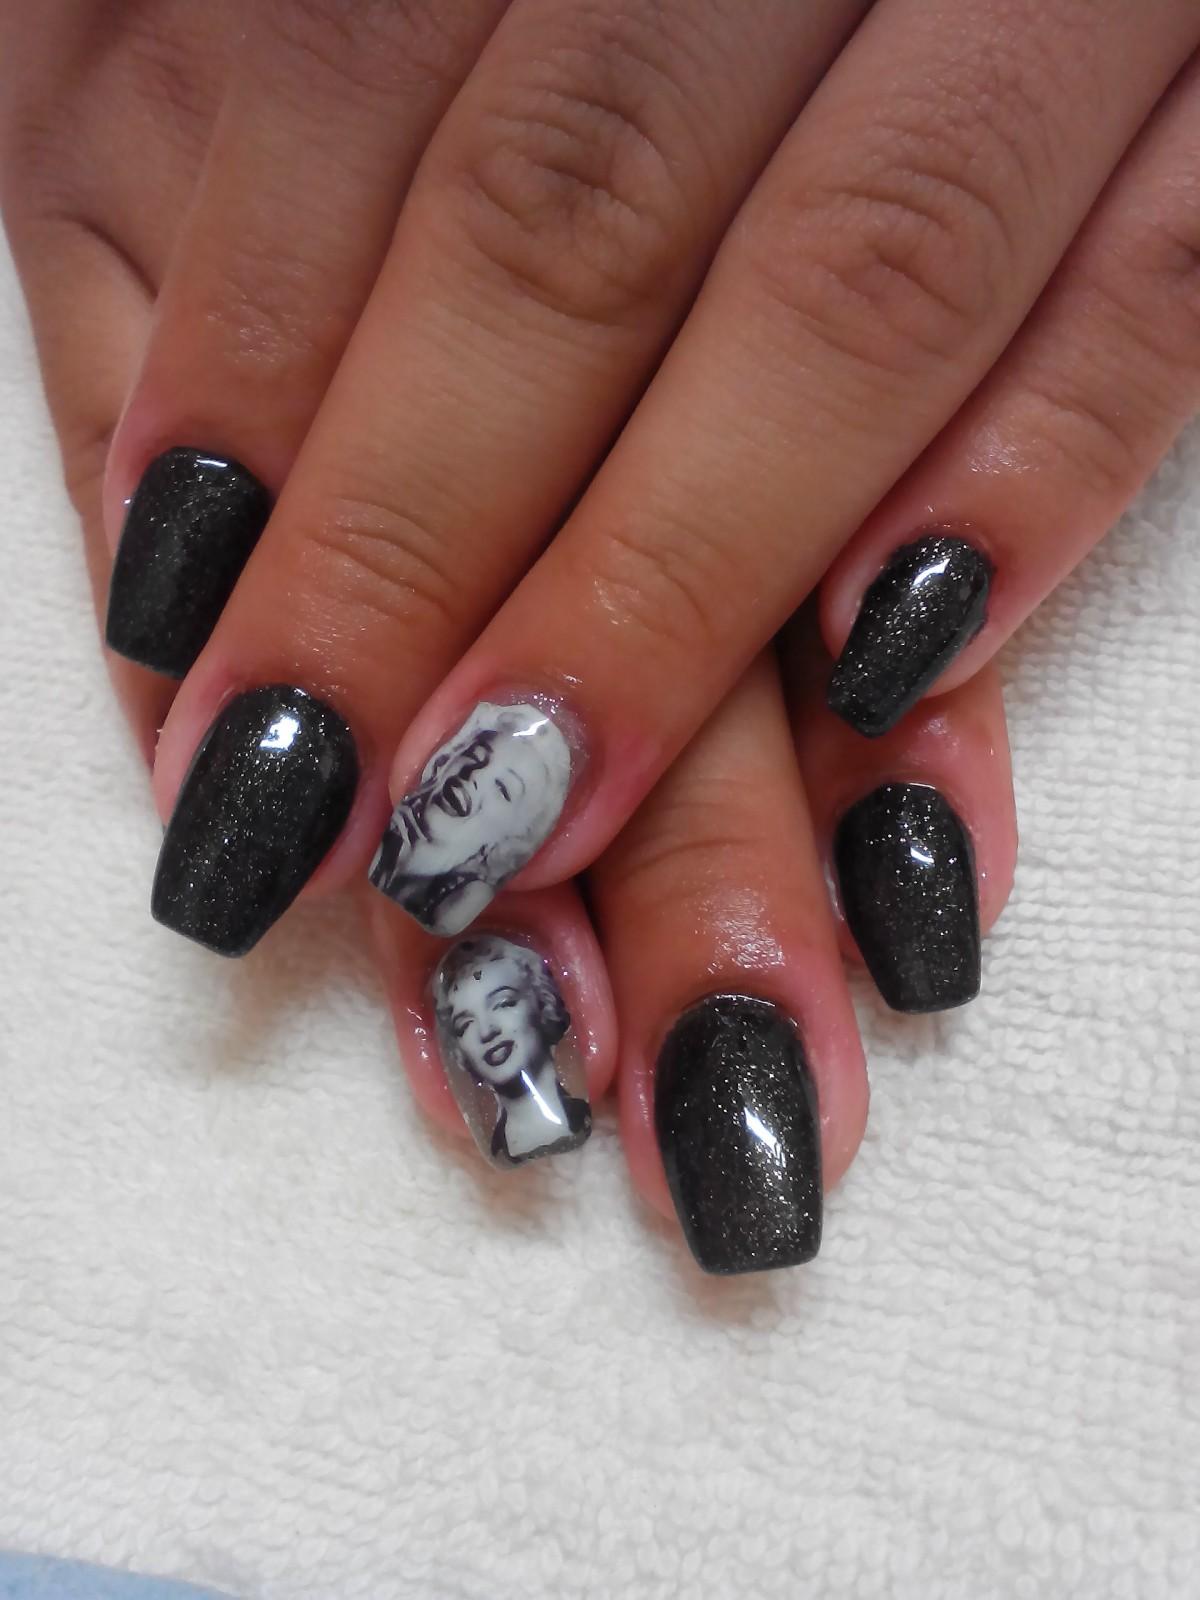 Free Images : Hand, Finger, Manicure, Nail Polish